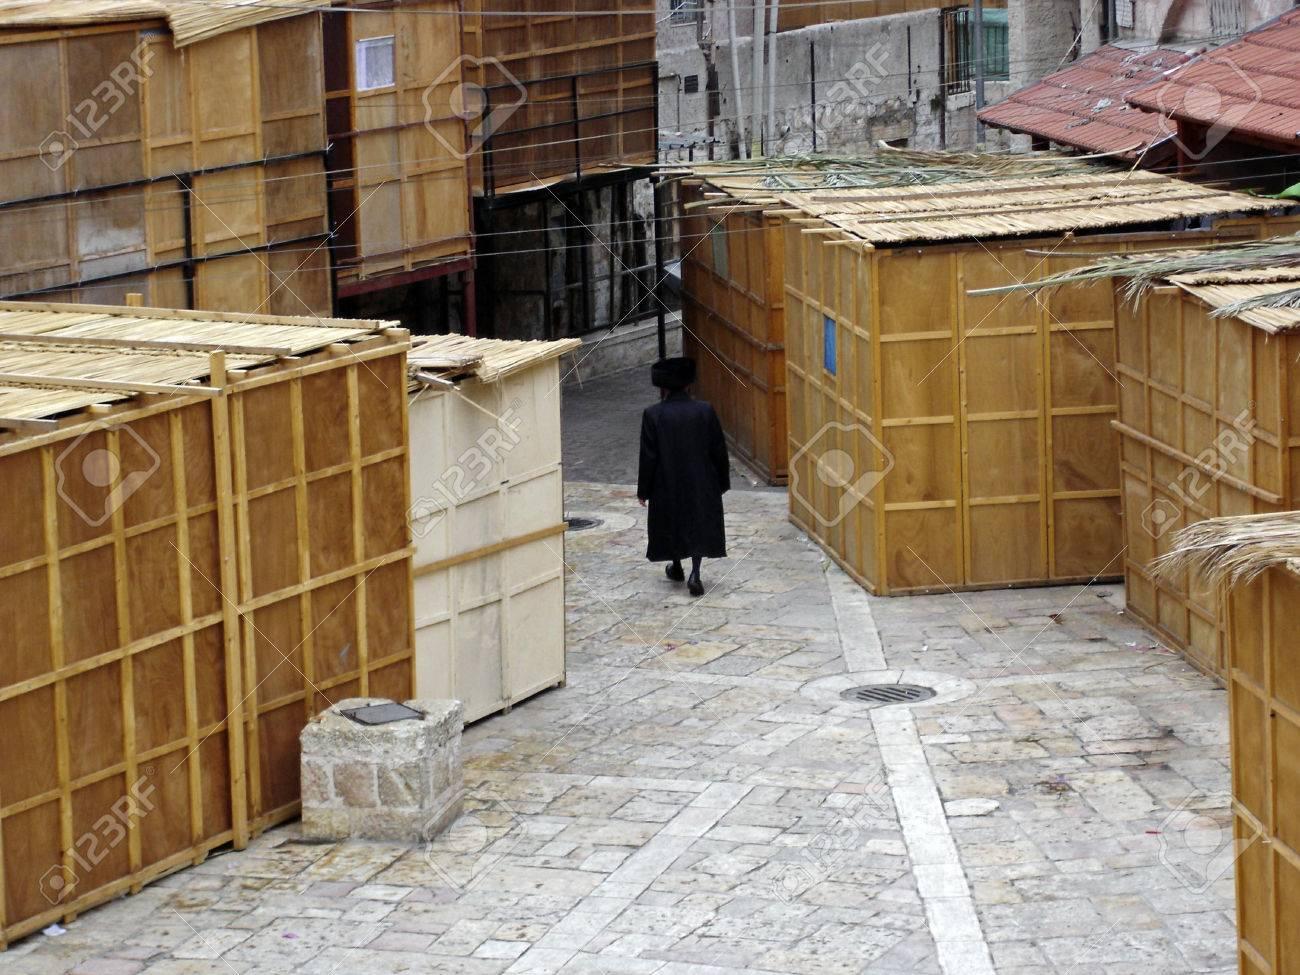 Sukkot in Meah Shearim neighborhood in Jerusalem, Israel. - 46902251